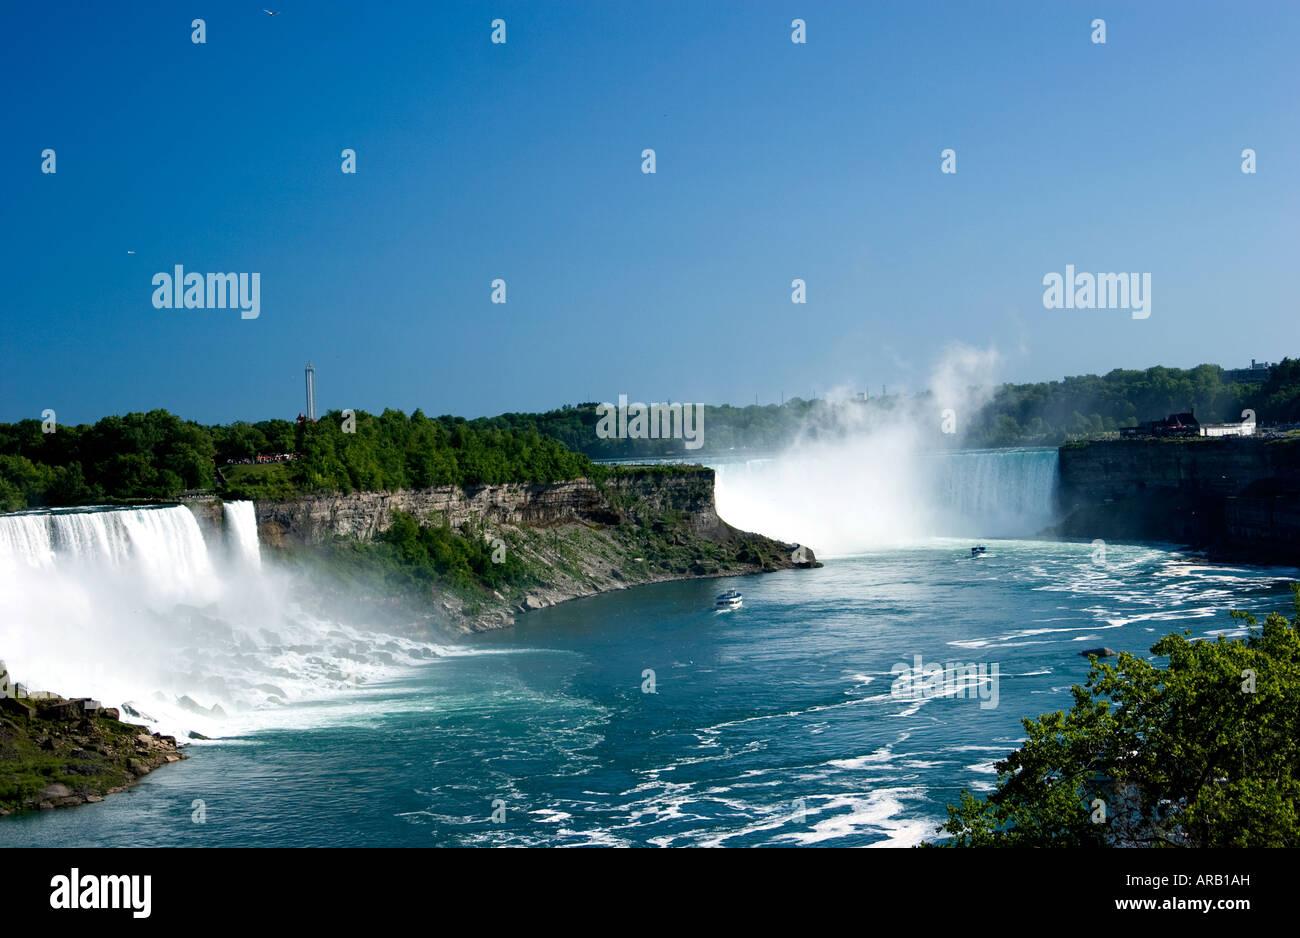 Niagara Falls Ontario Canada showing Canadian and American falls - Stock Image